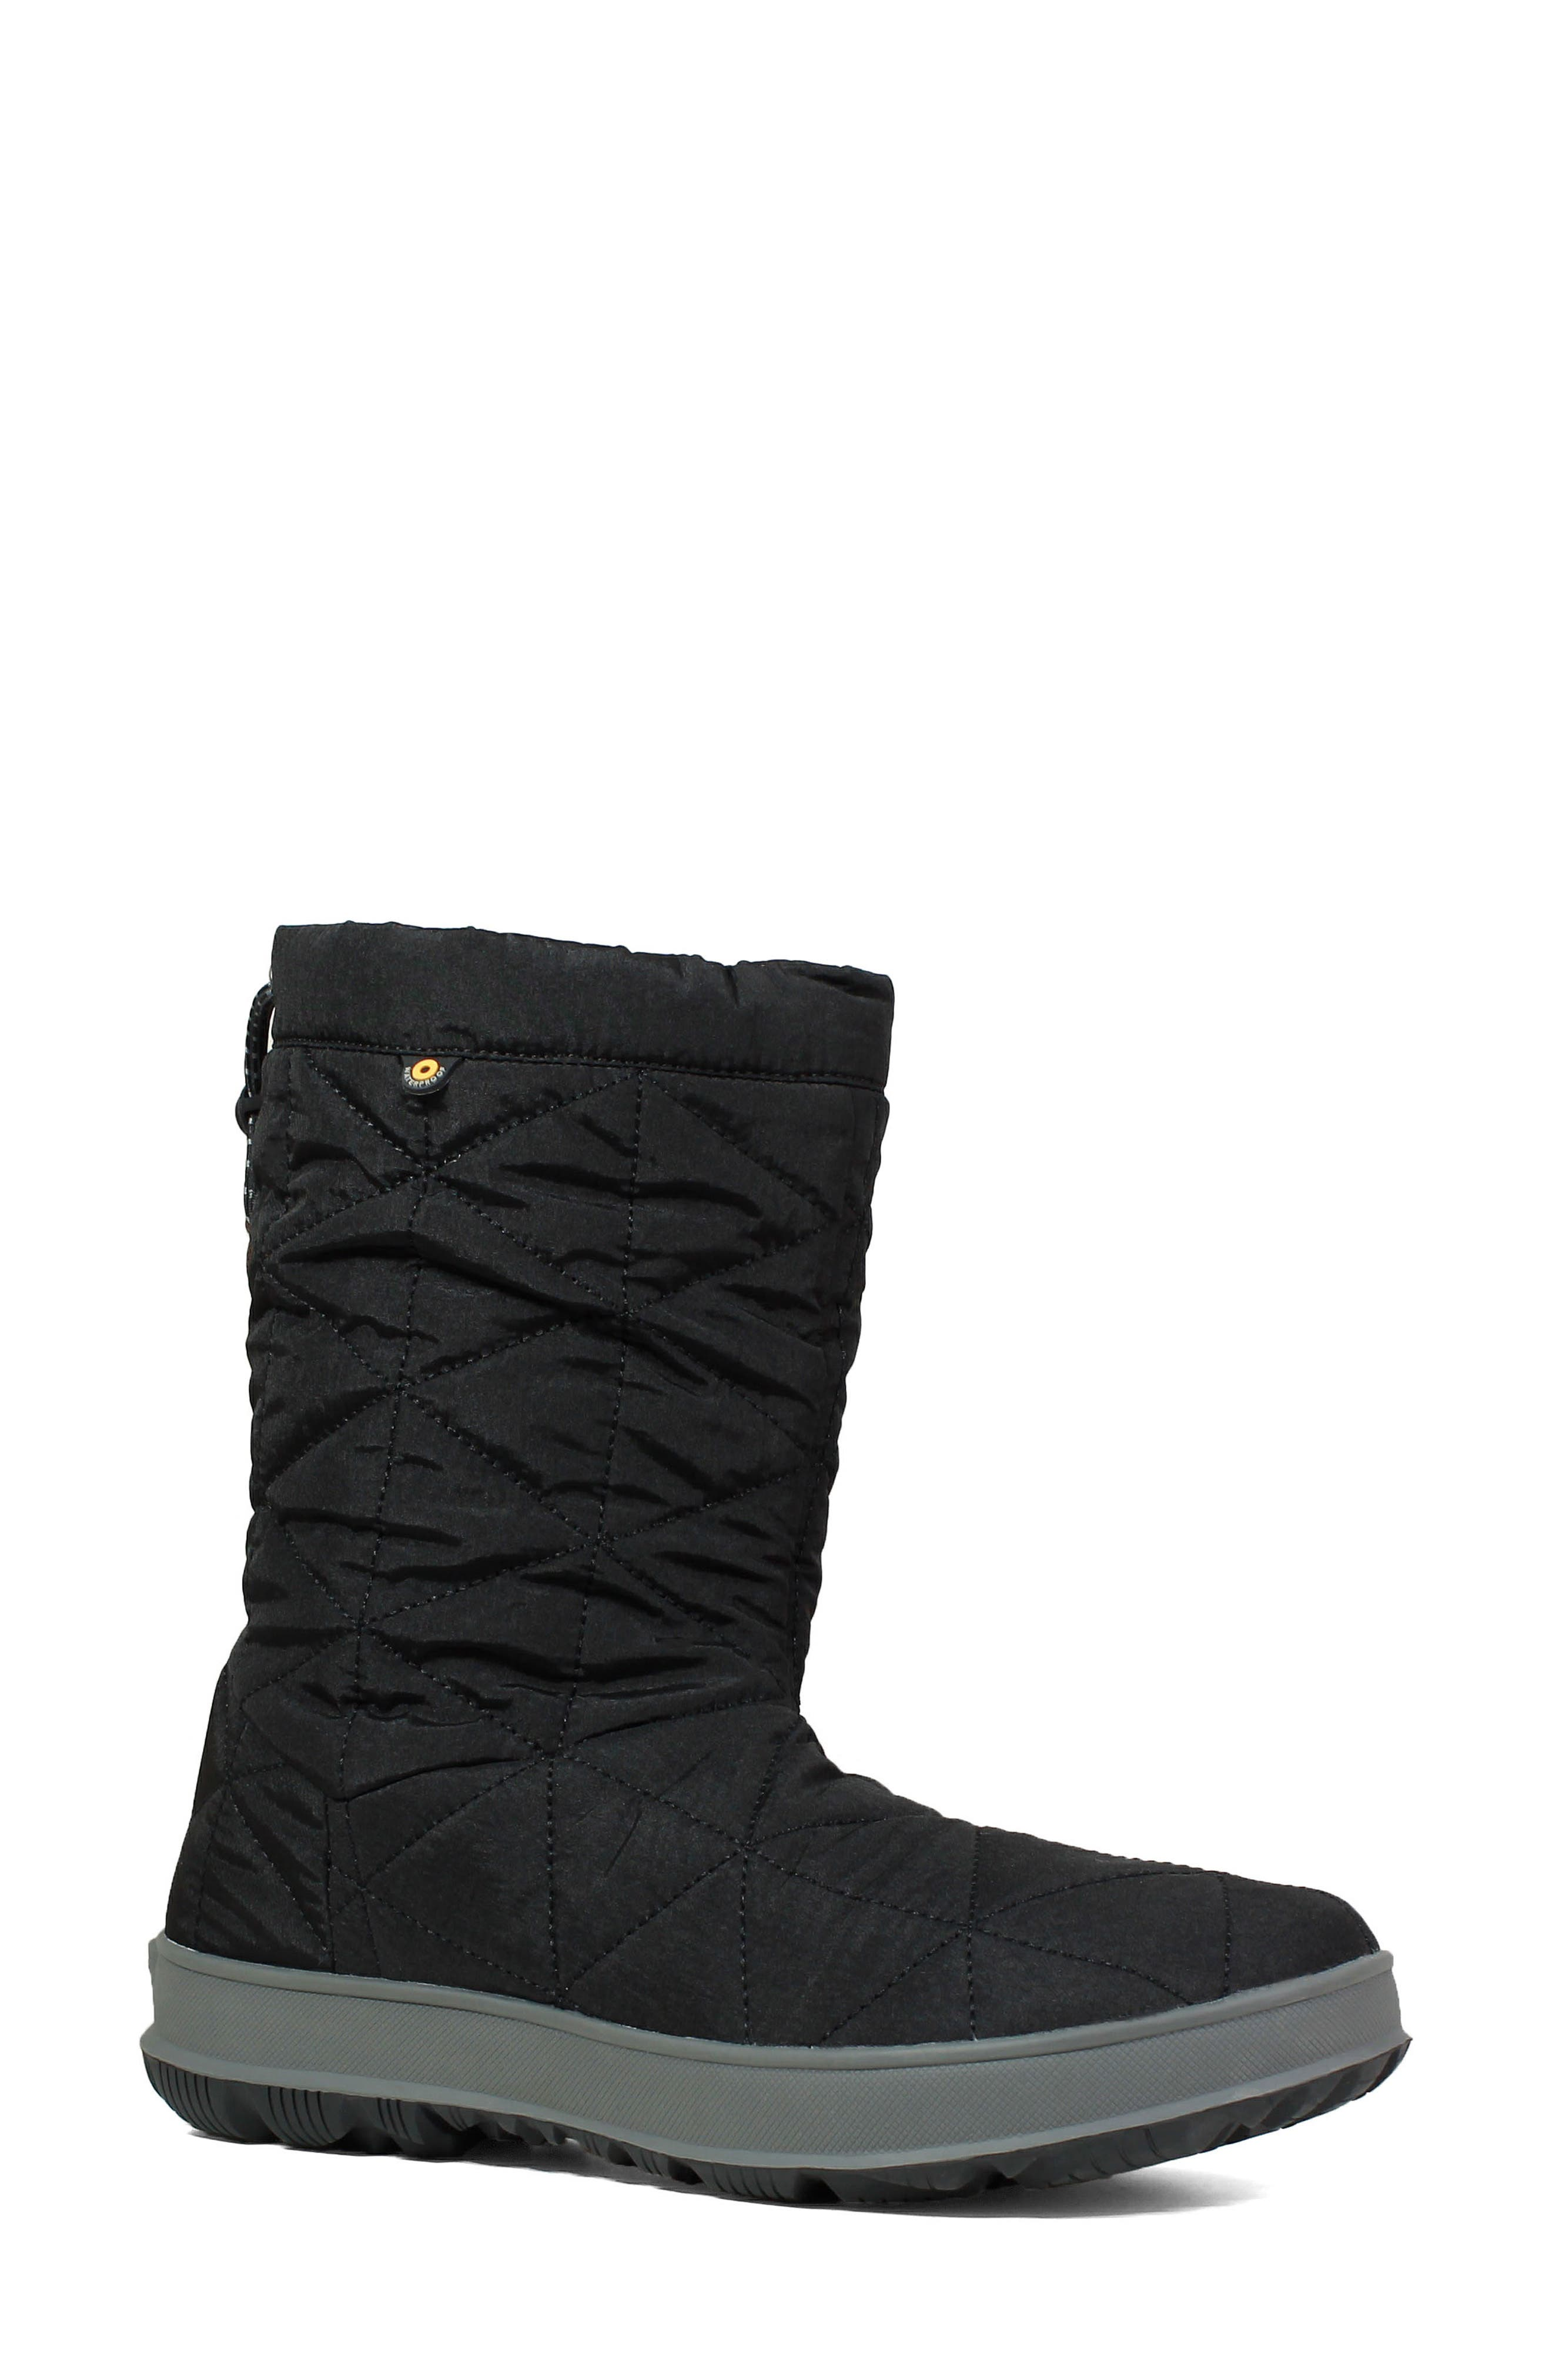 BOGS Mid Snowday Waterproof Bootie, Main, color, BLACK